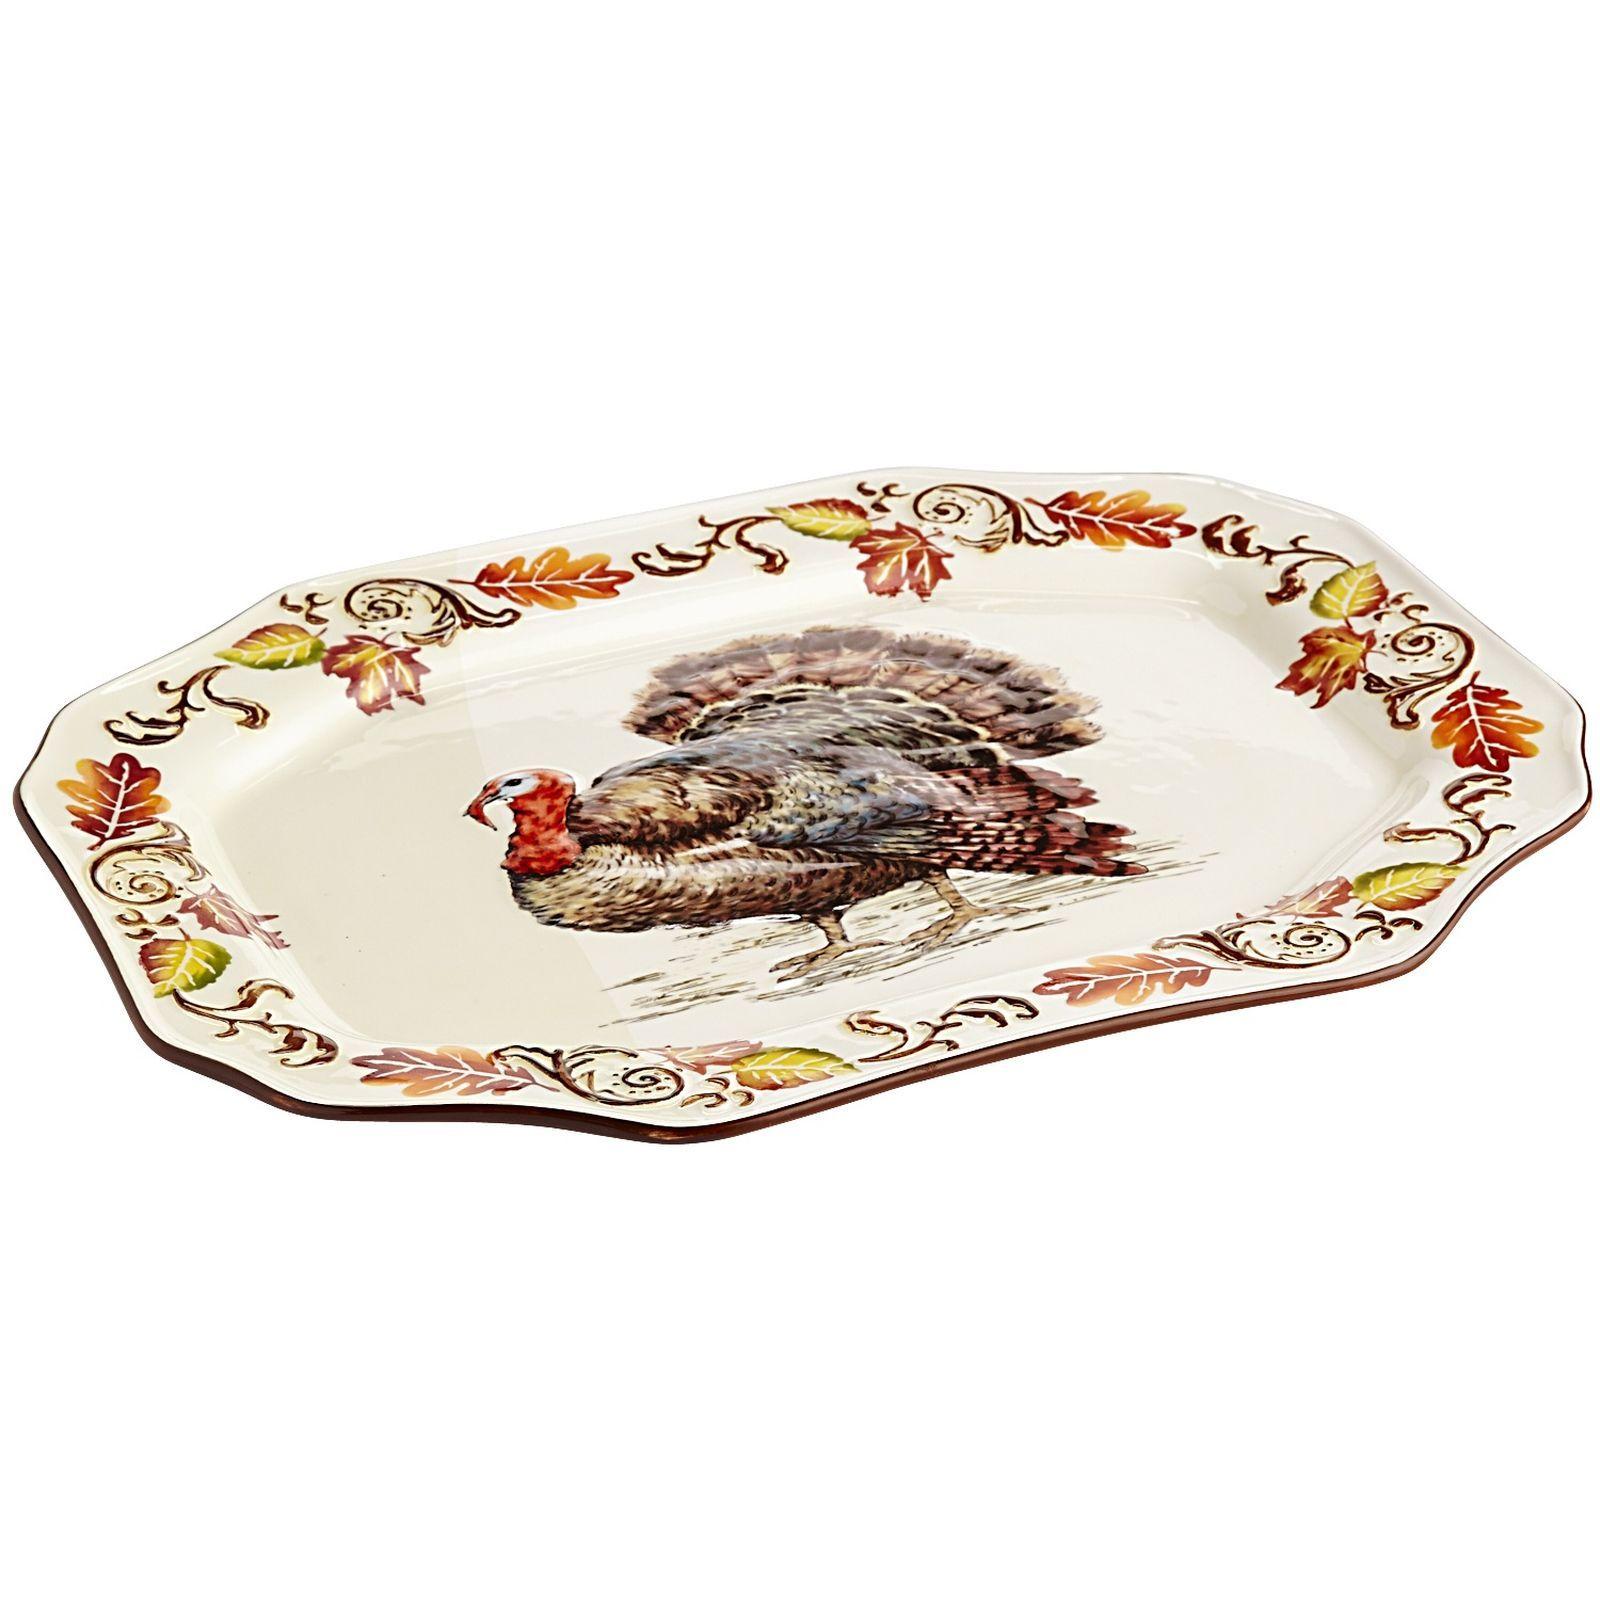 Turkey Platter | Pier 1 Imports -Nicki